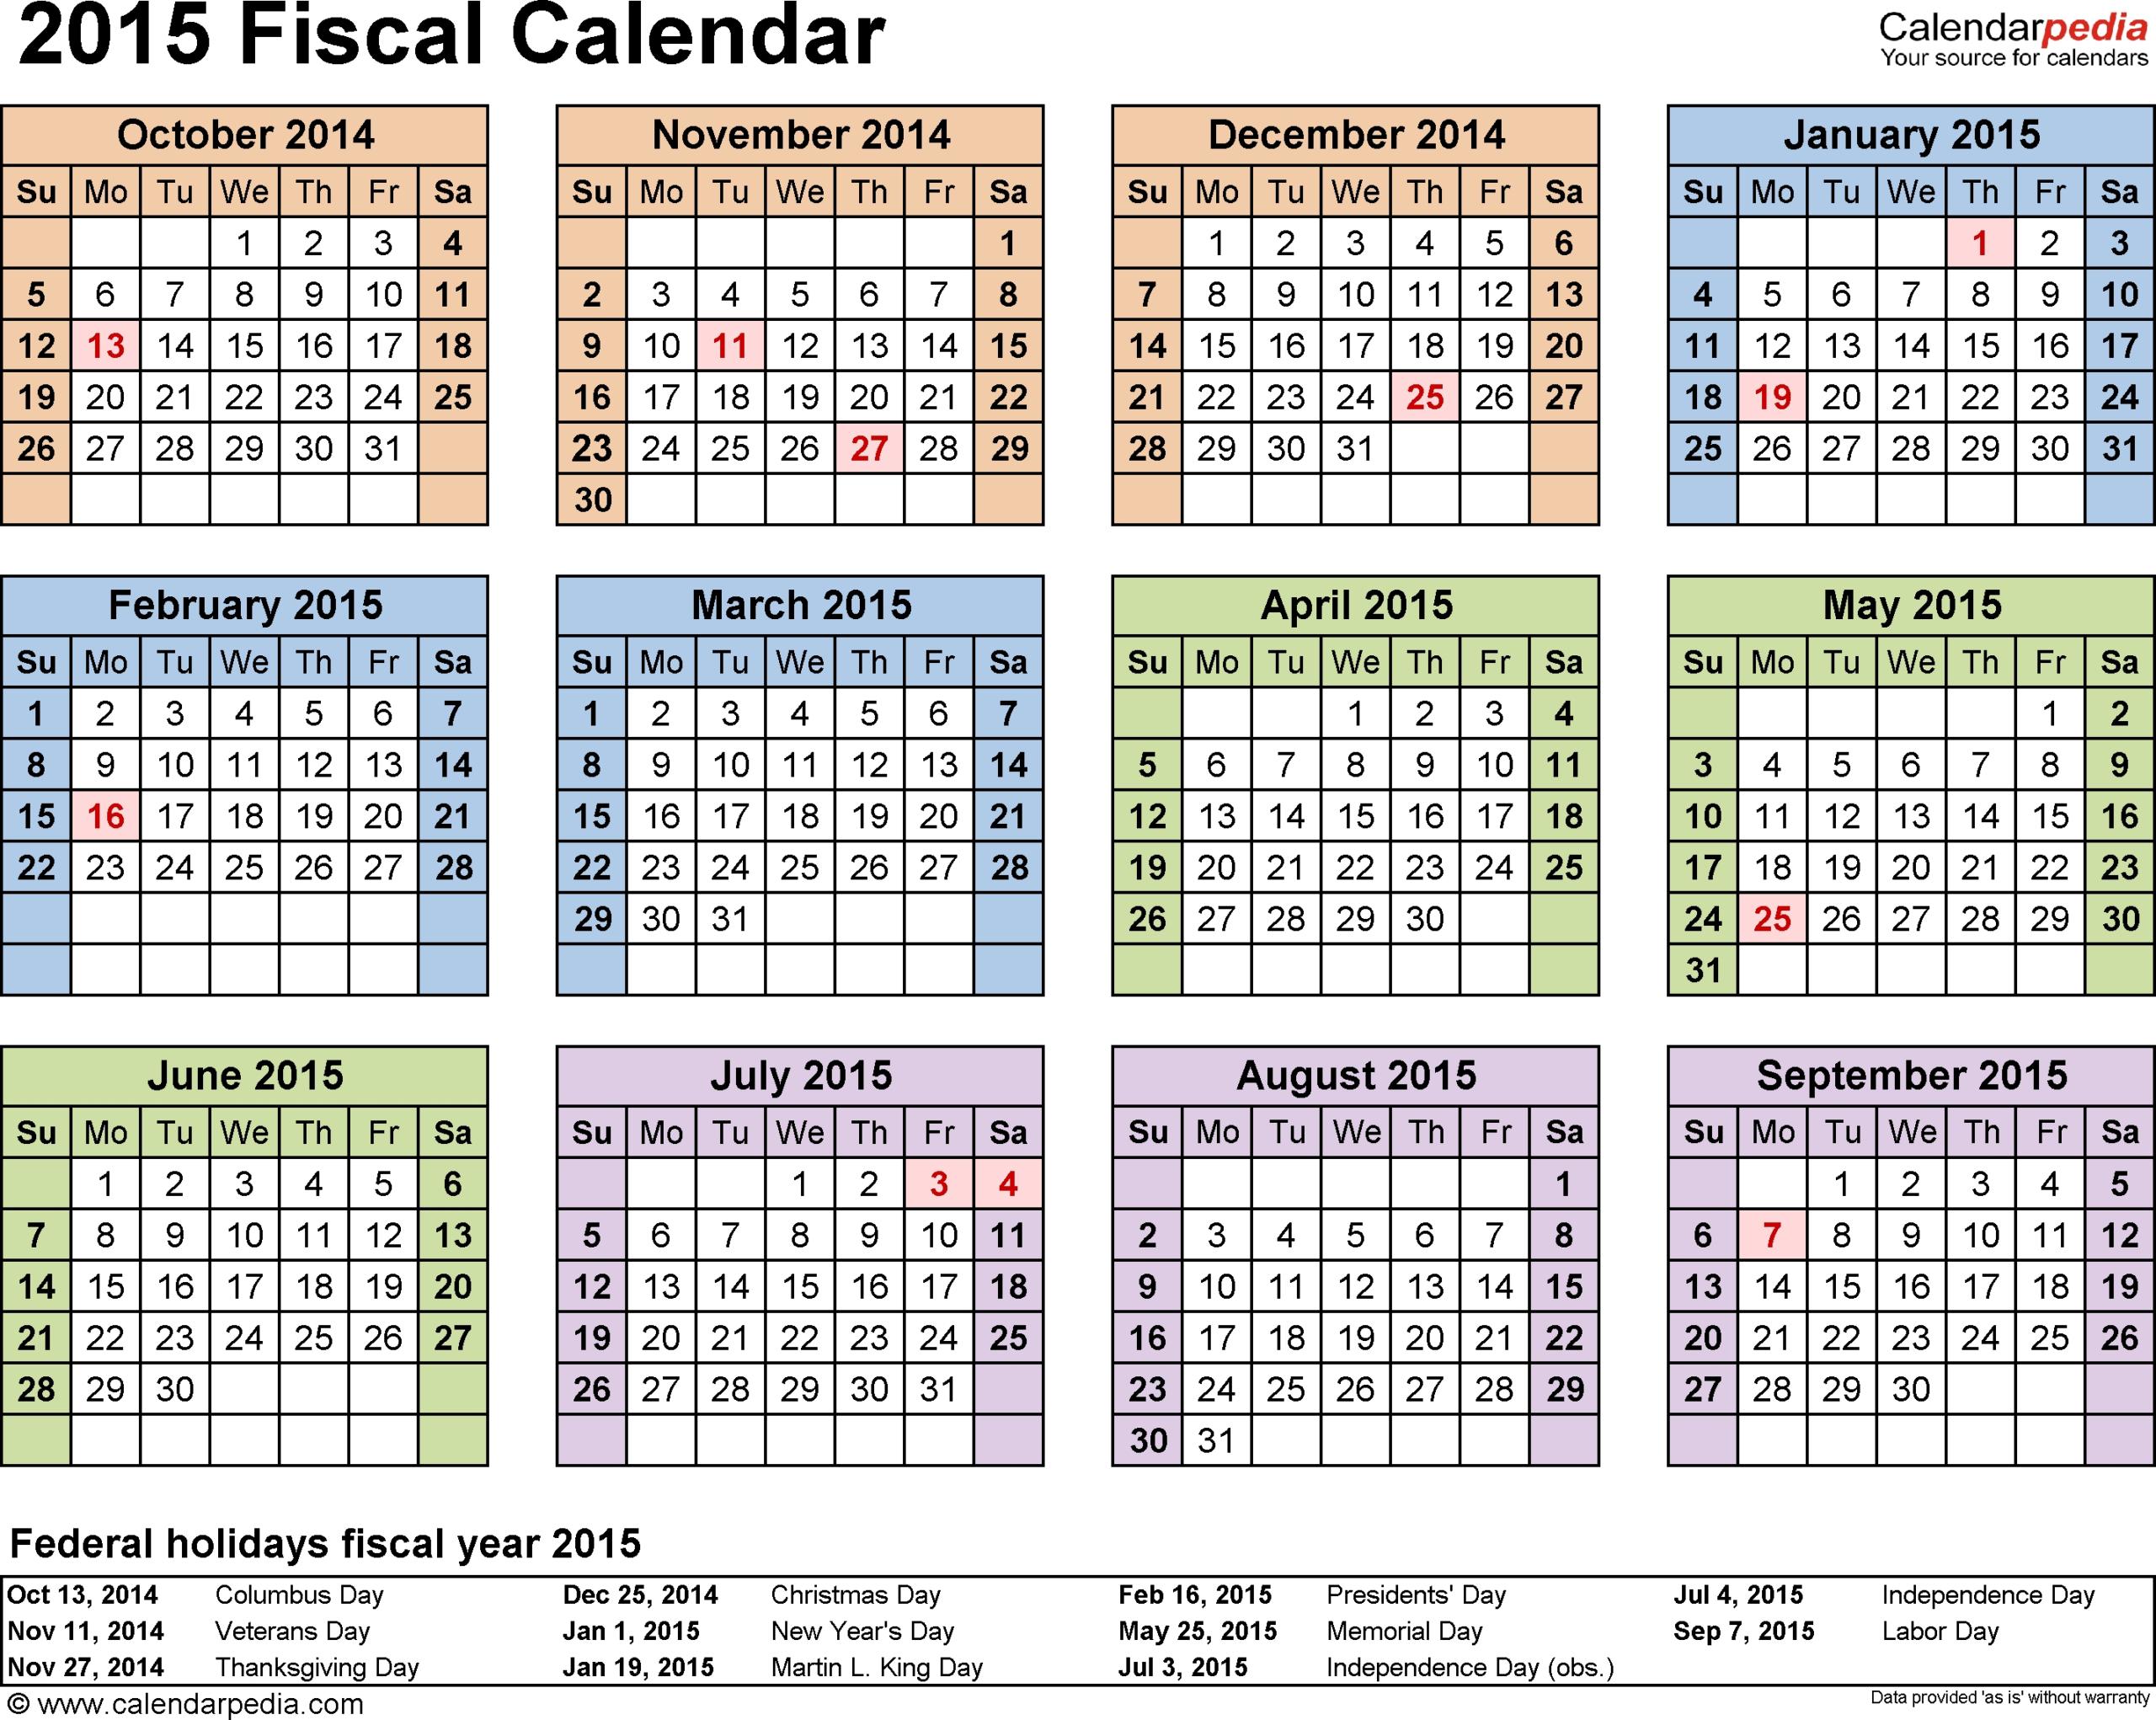 2020 4-4-5 Fiscal Accouting Calendar - Calendar